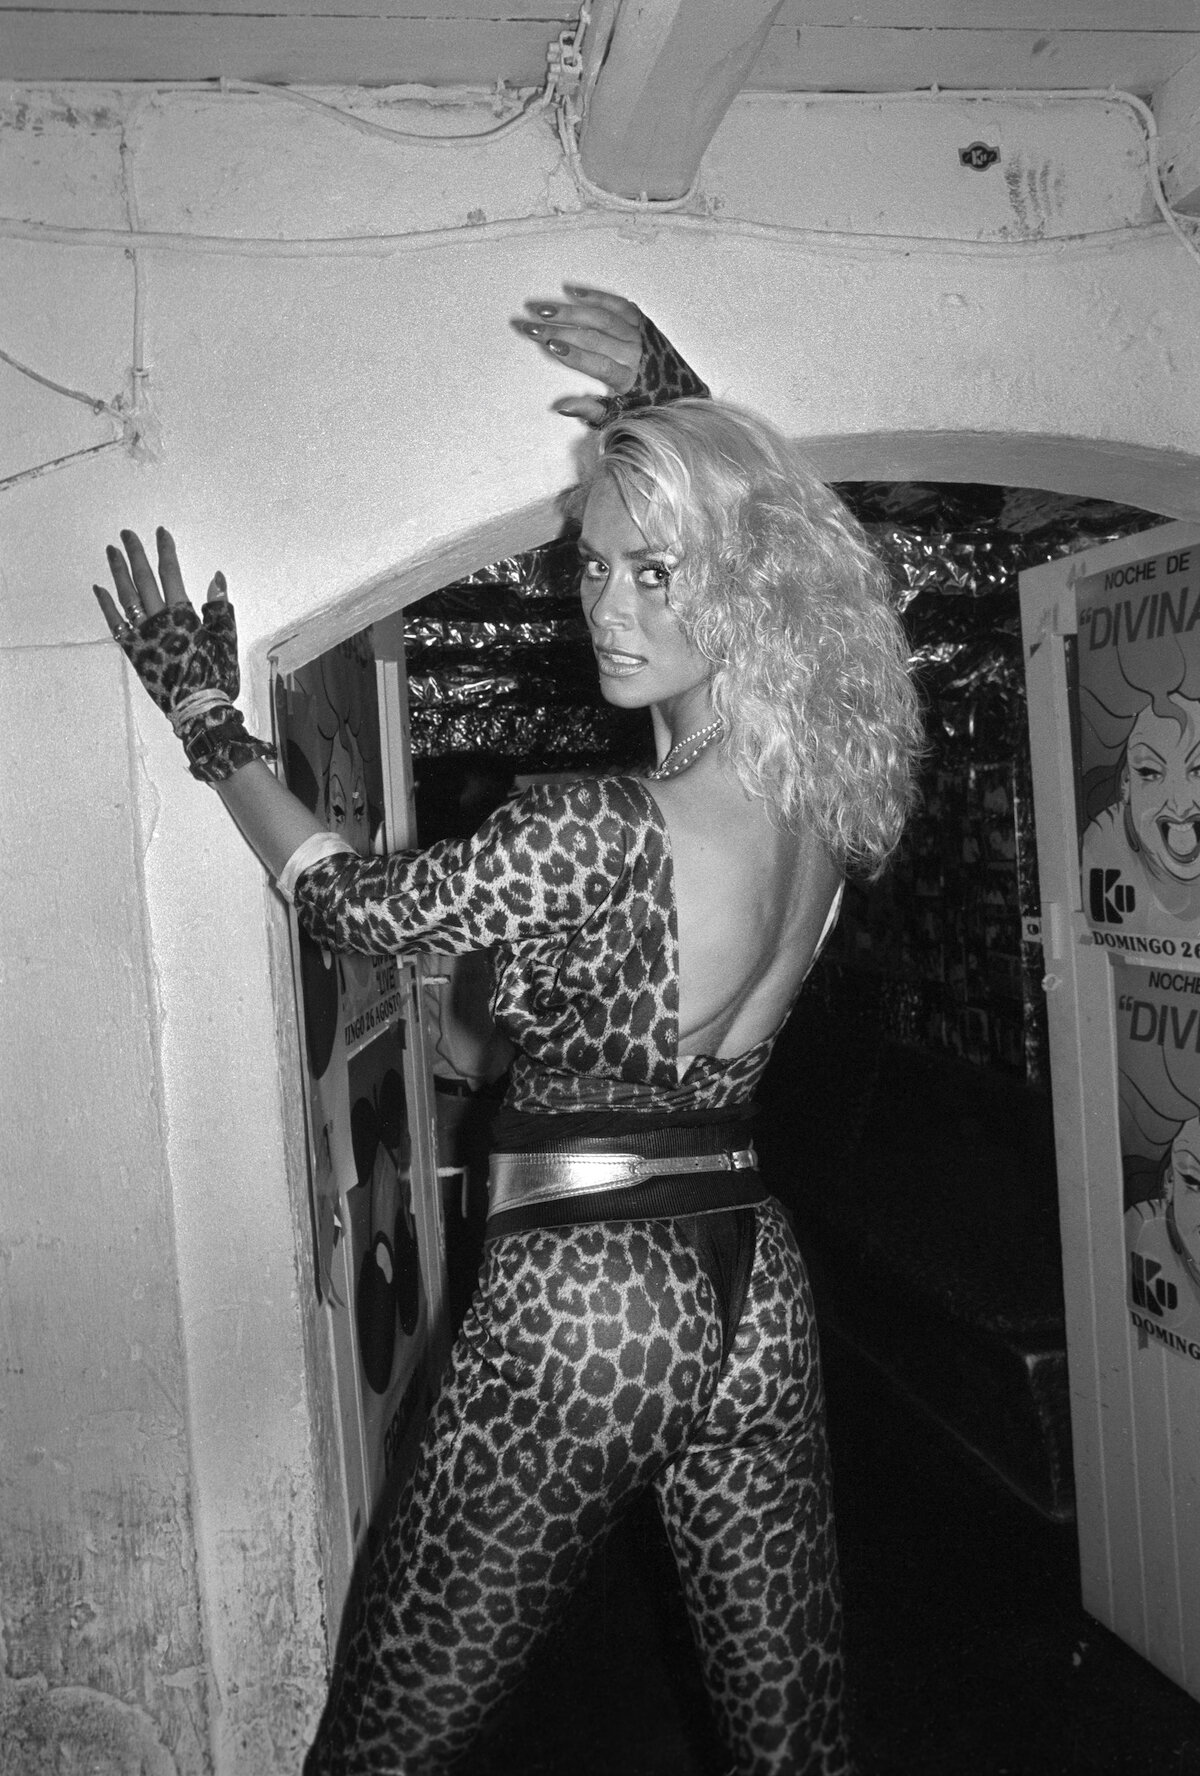 derek_ridgers_archive_Ibiza_unravel_productions_03.jpg